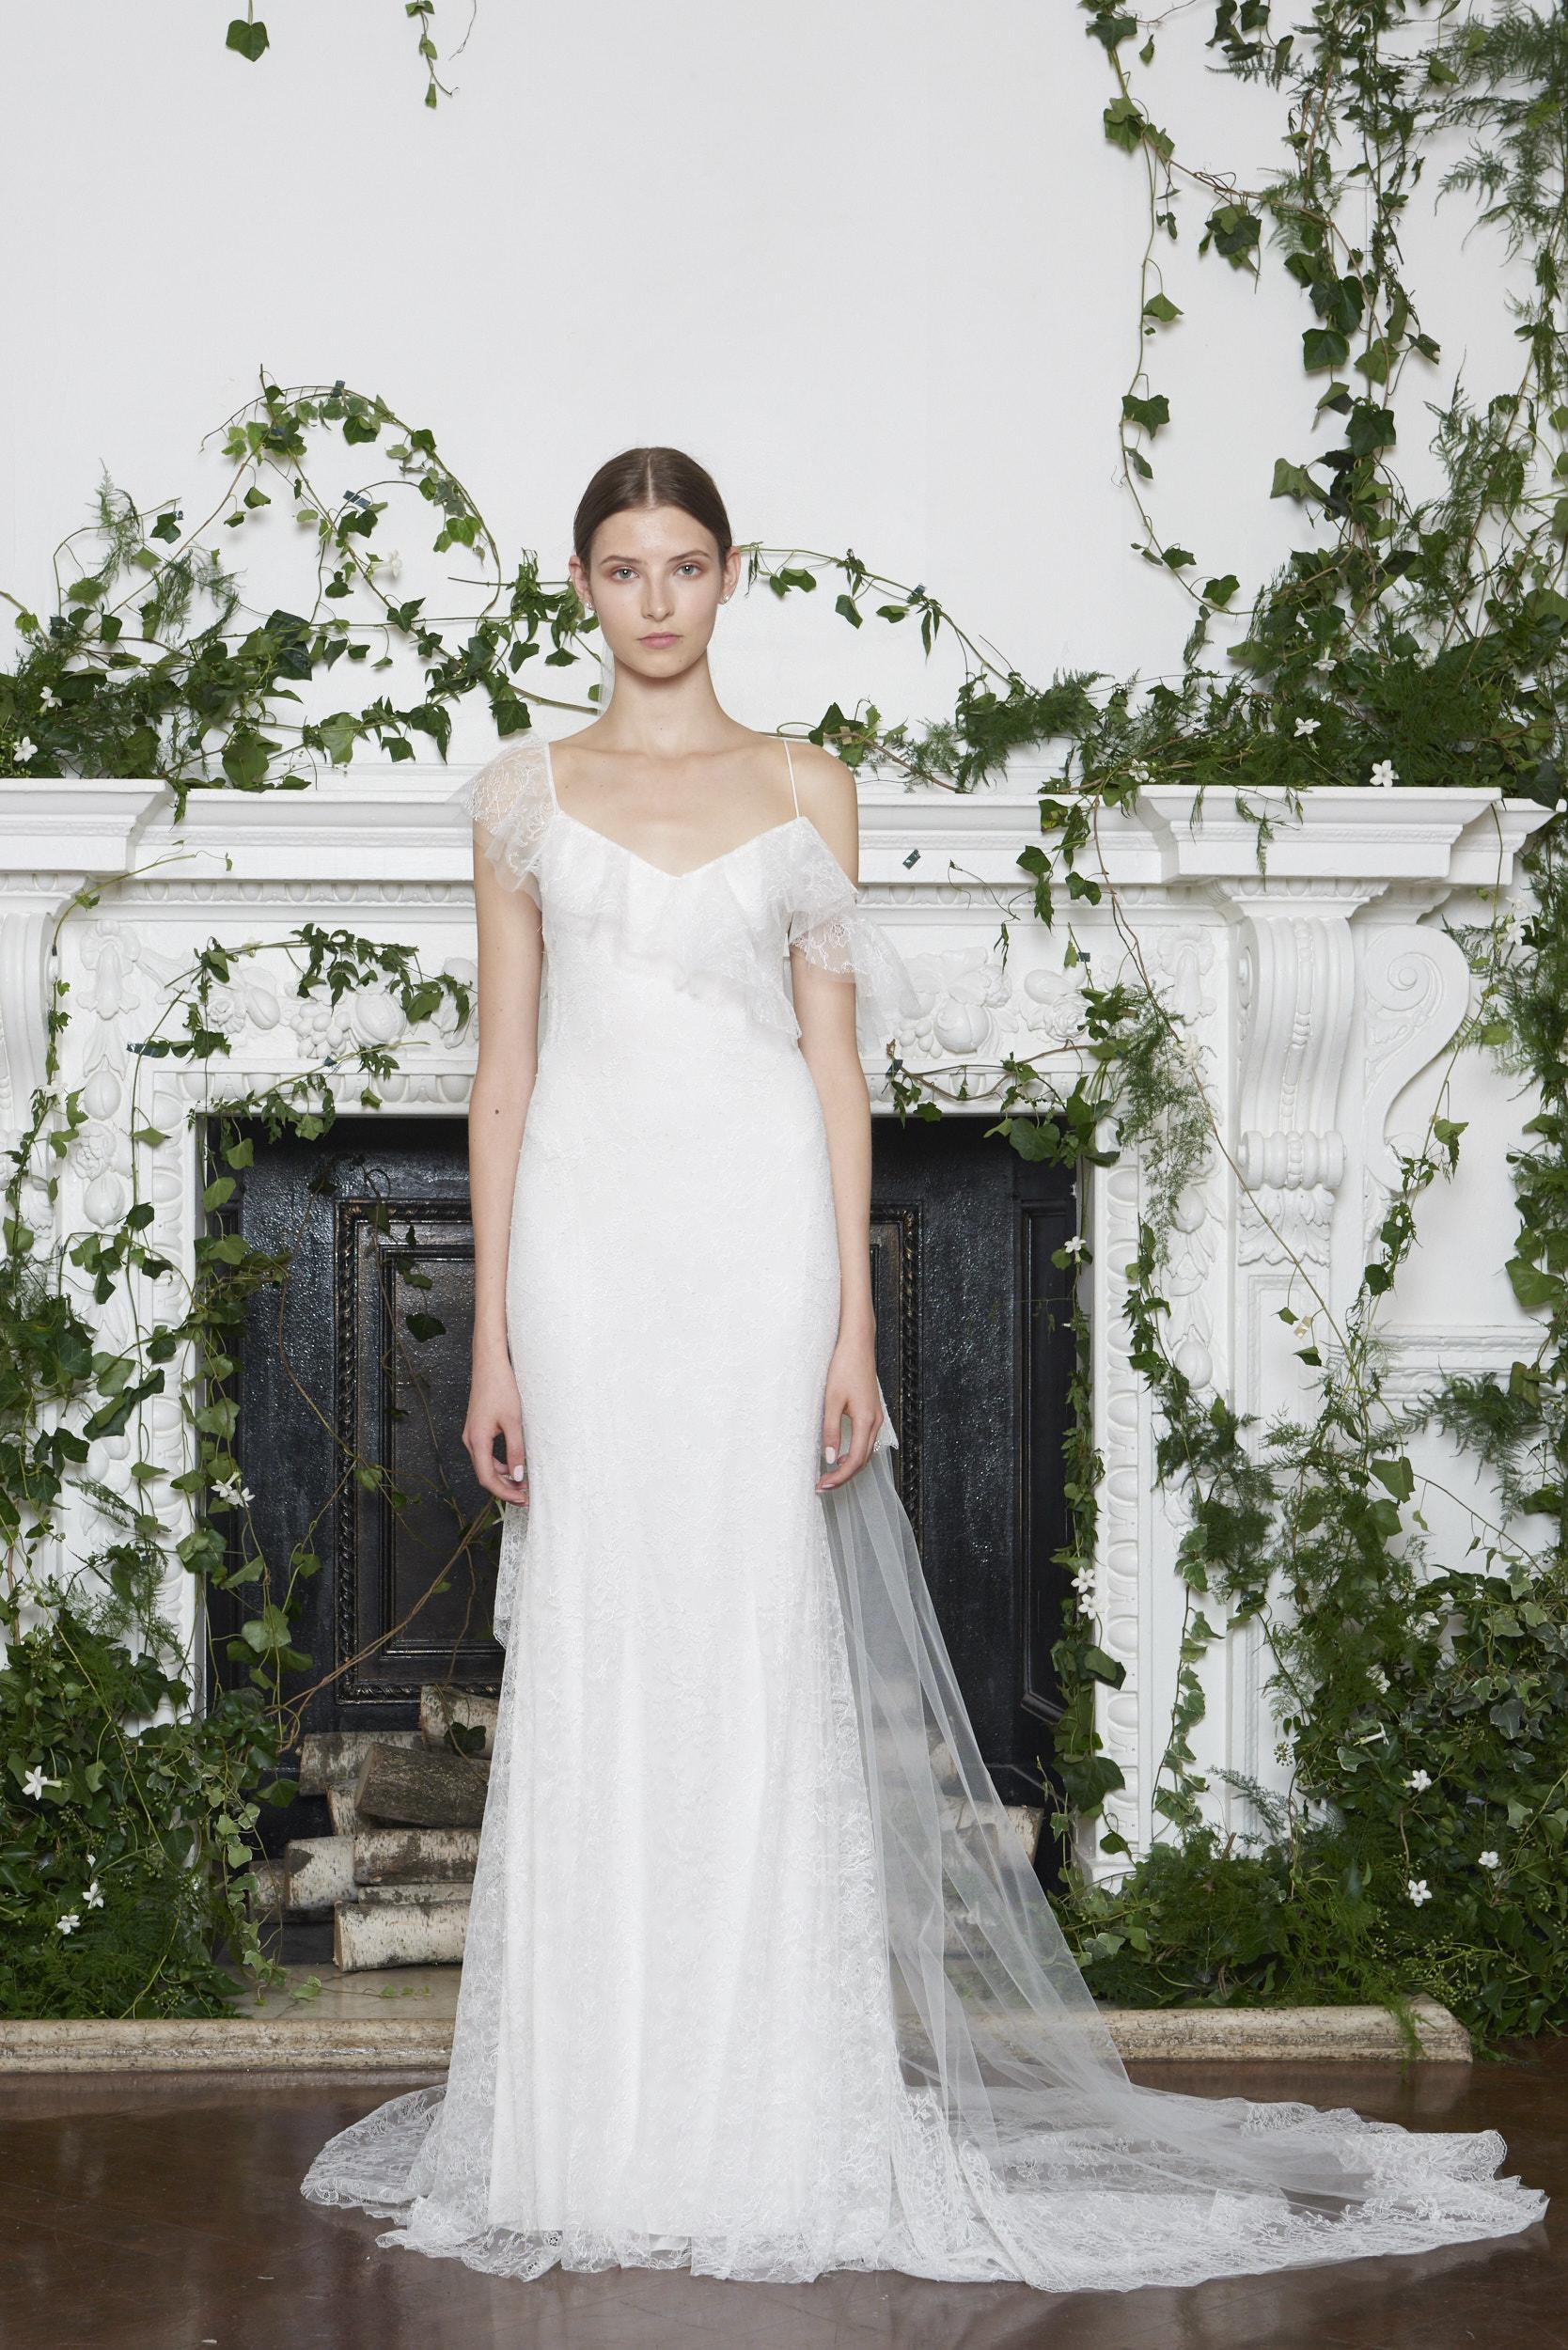 Monique Lhuillier Fall 2018 Sheath Wedding Dress with Asymmetrical Sleeves